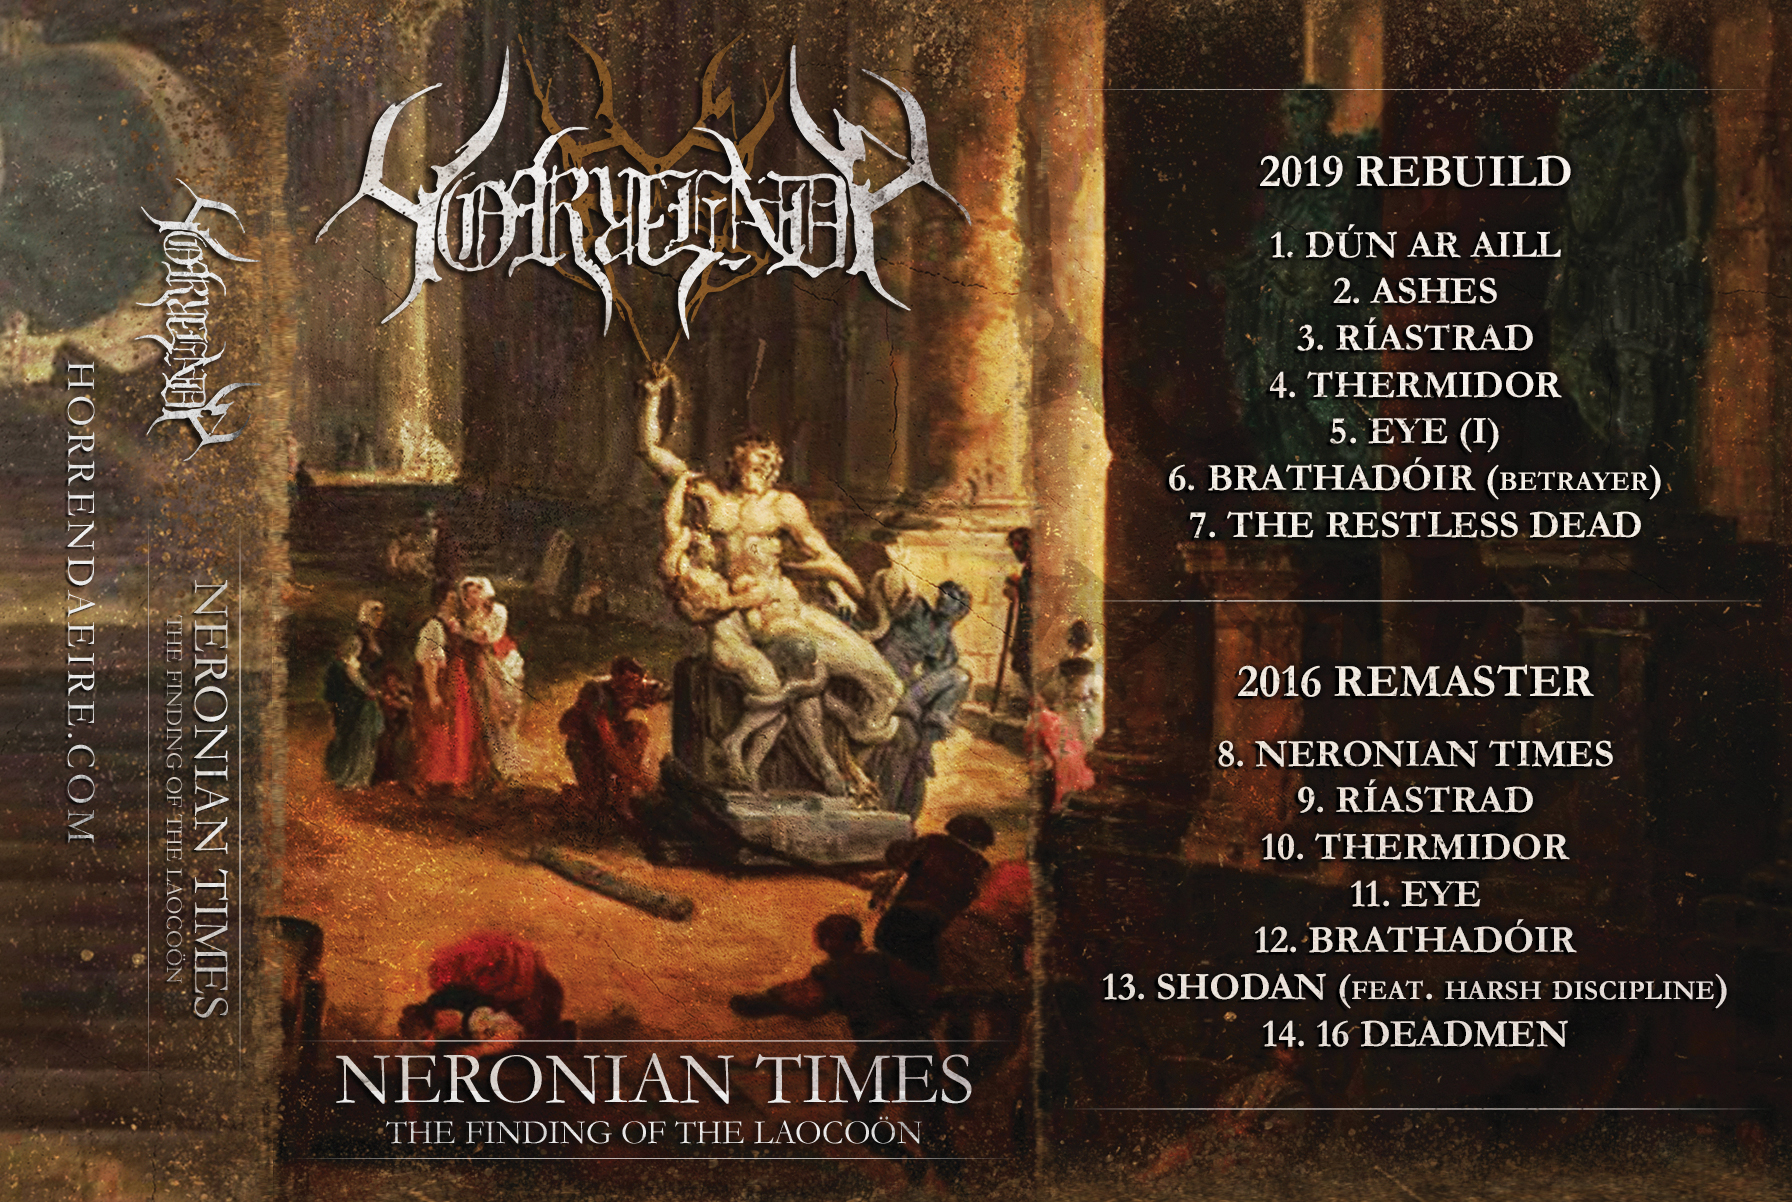 Horrenda - Neronian Times (Remaster) Cassette Case 1